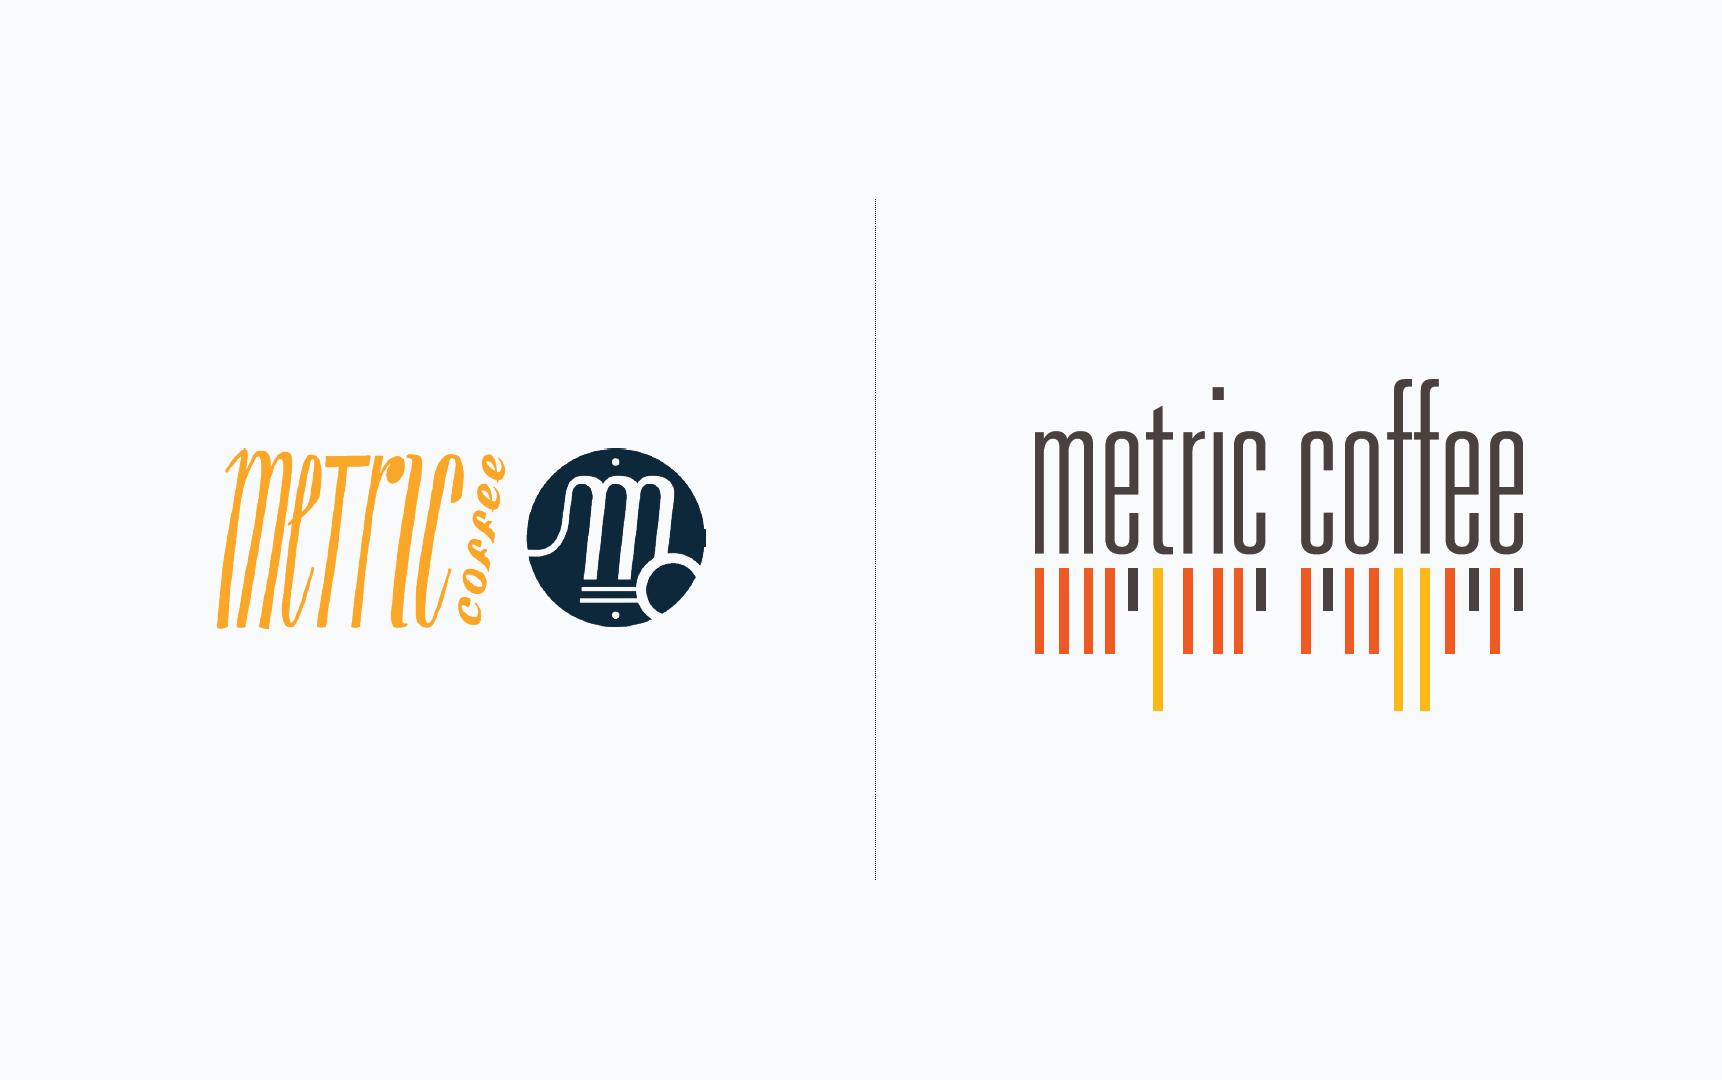 metric coffee identity redesign